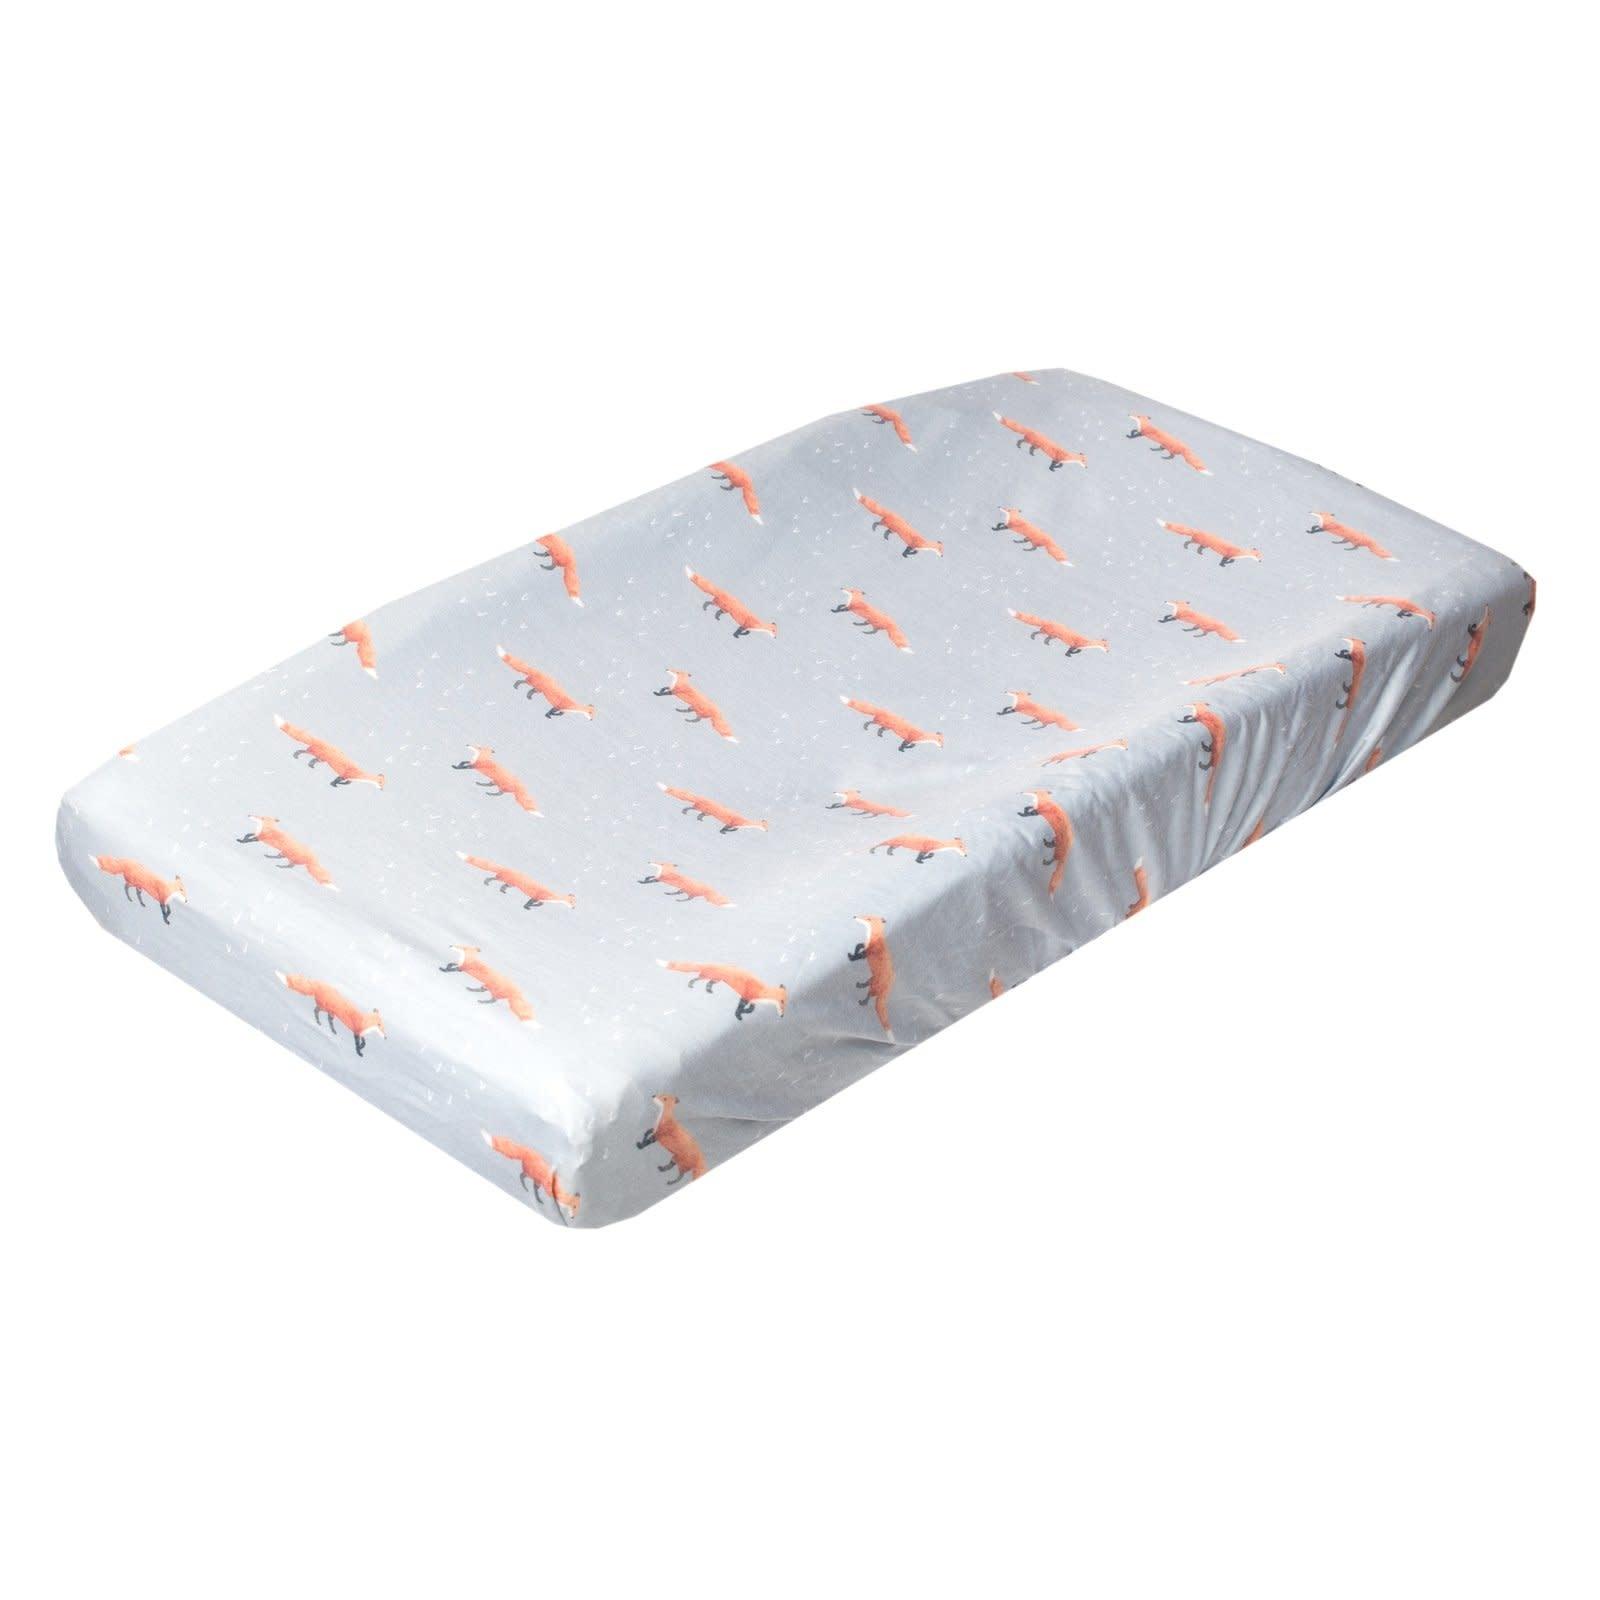 Copper Pearl Premium Diaper Changing Pad Cover Swift